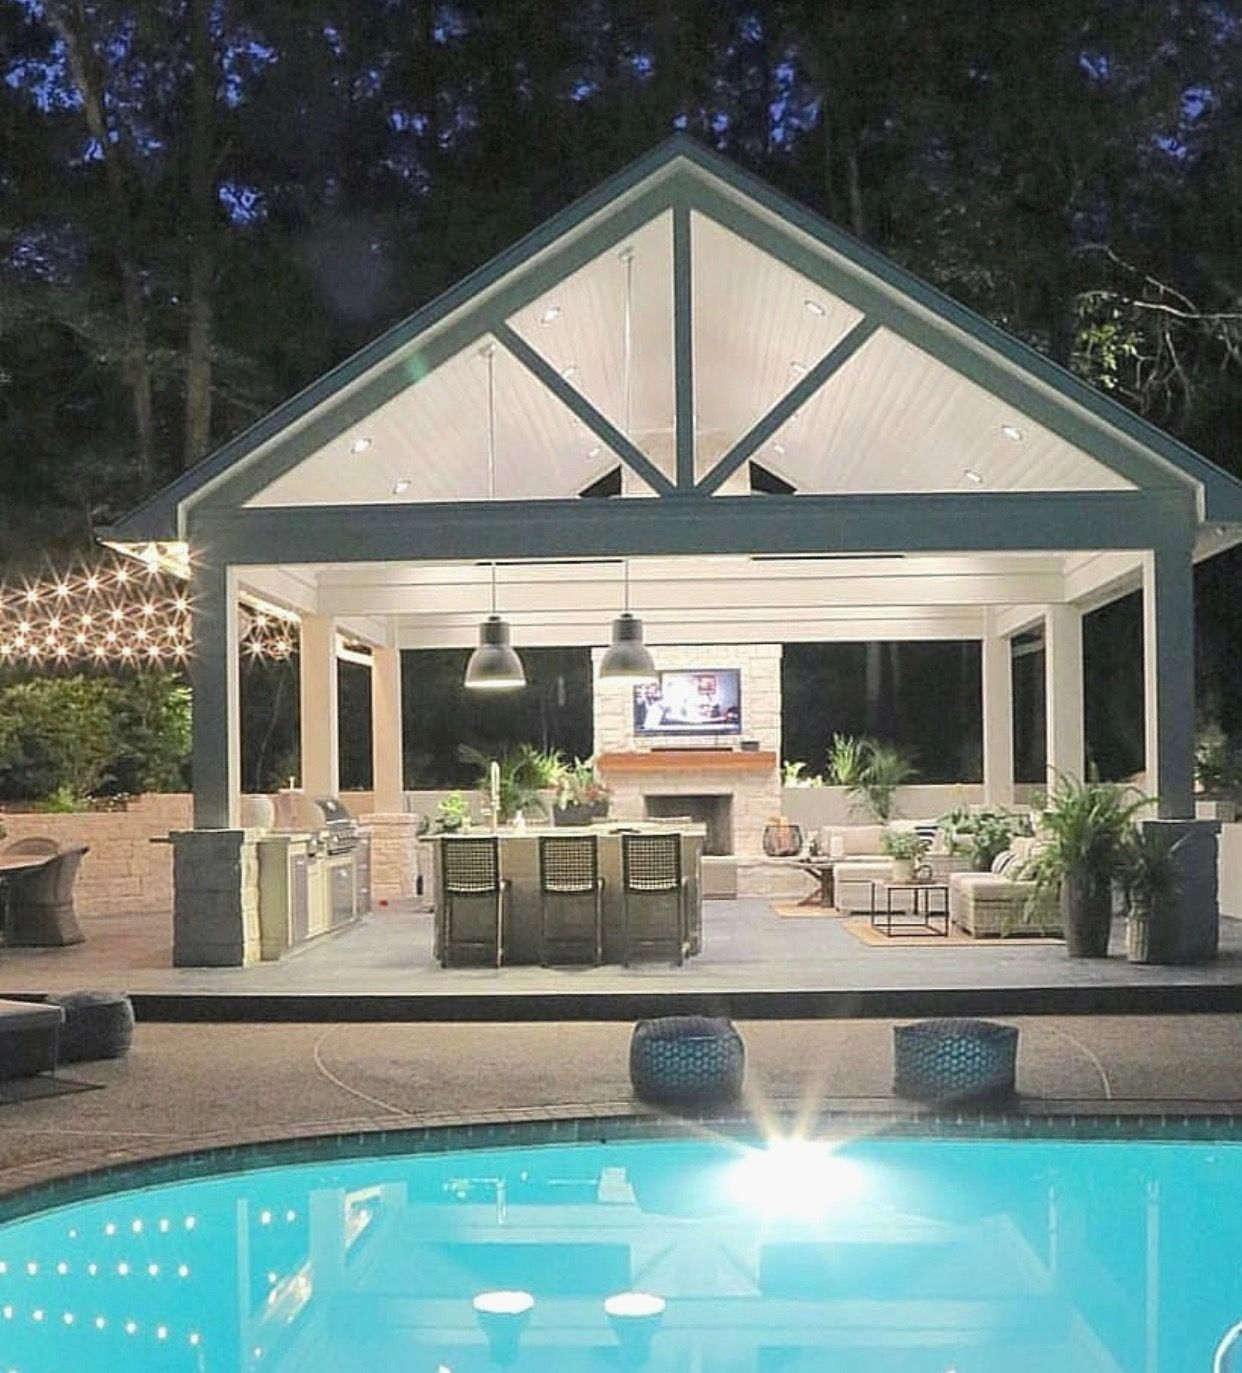 37 Gorgeous Backyard Pool Ideas With Inground Landscaping Design Backyard Pool Backyard Pool Designs Backyard Patio Designs